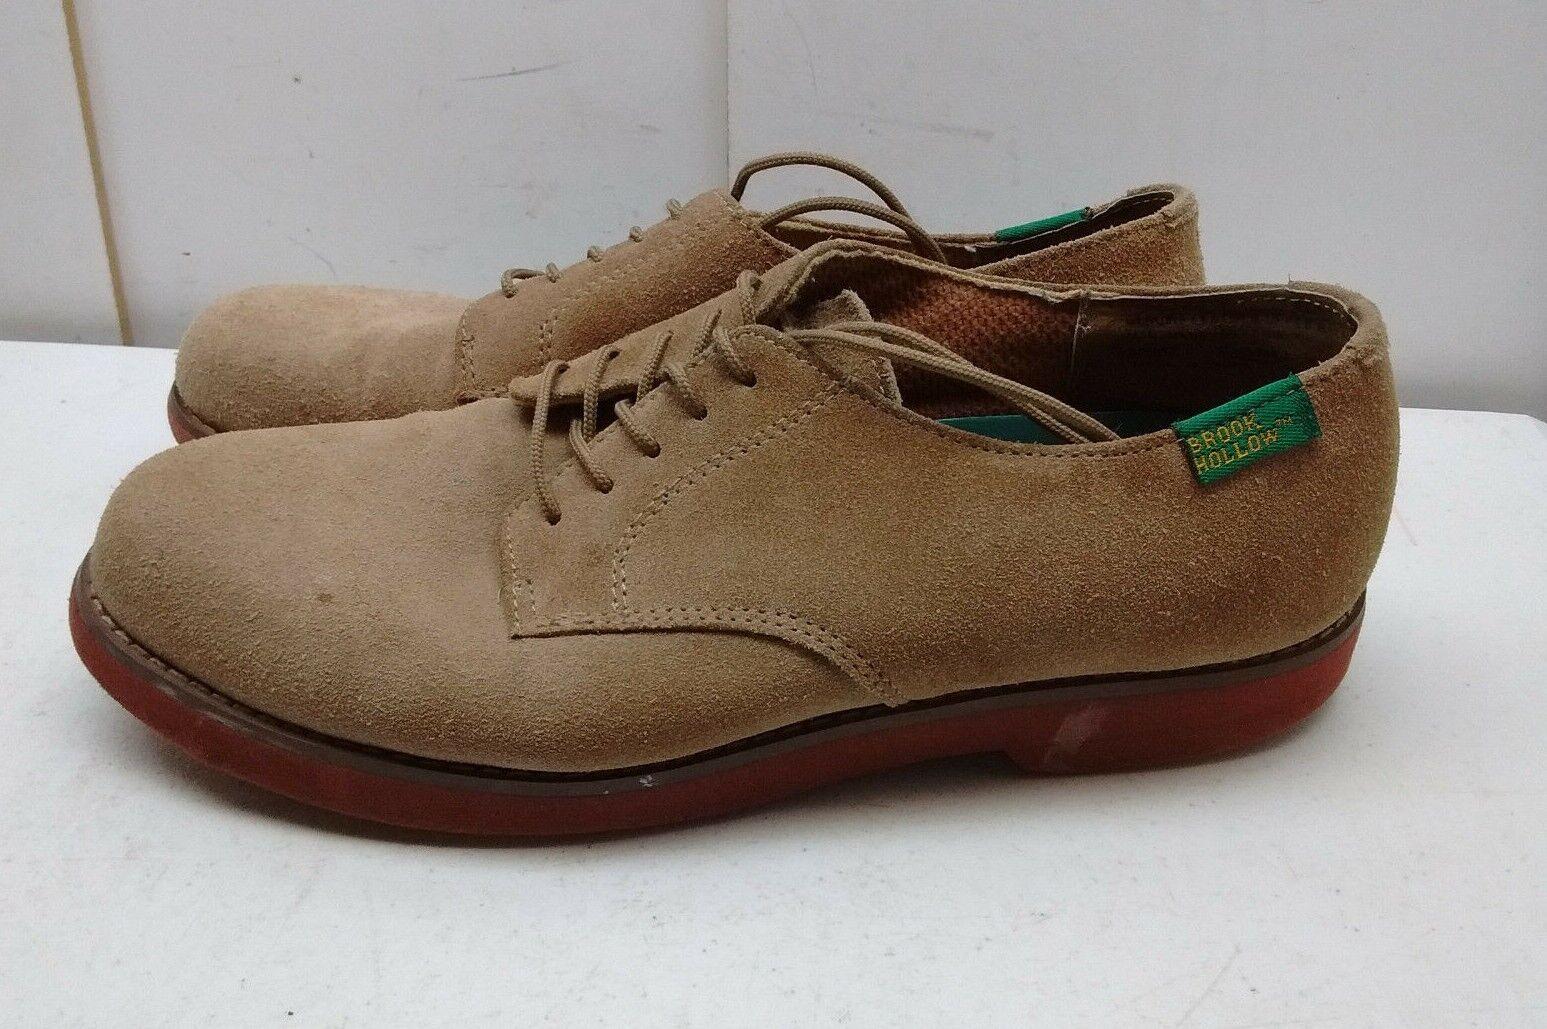 Brook hueco tan Cuero Oxford Plain Toe Con Cordones Casual Comfort Hombres Zapato 10.5M